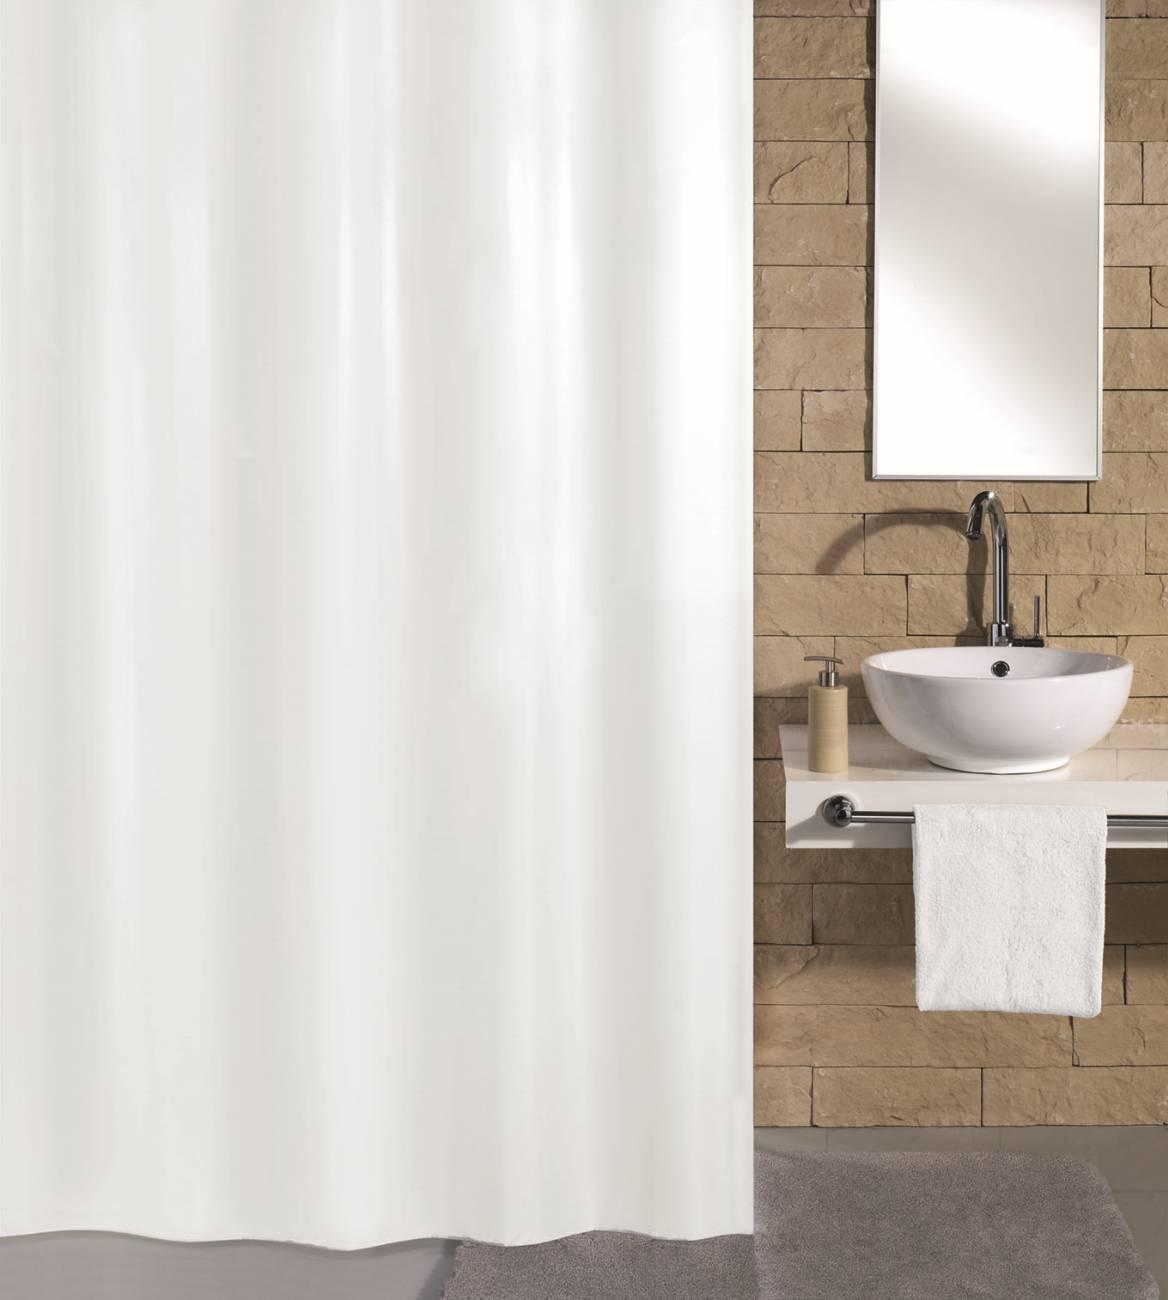 Duschvorhang Kito 100 % Polyester Nebel 120x200 cm